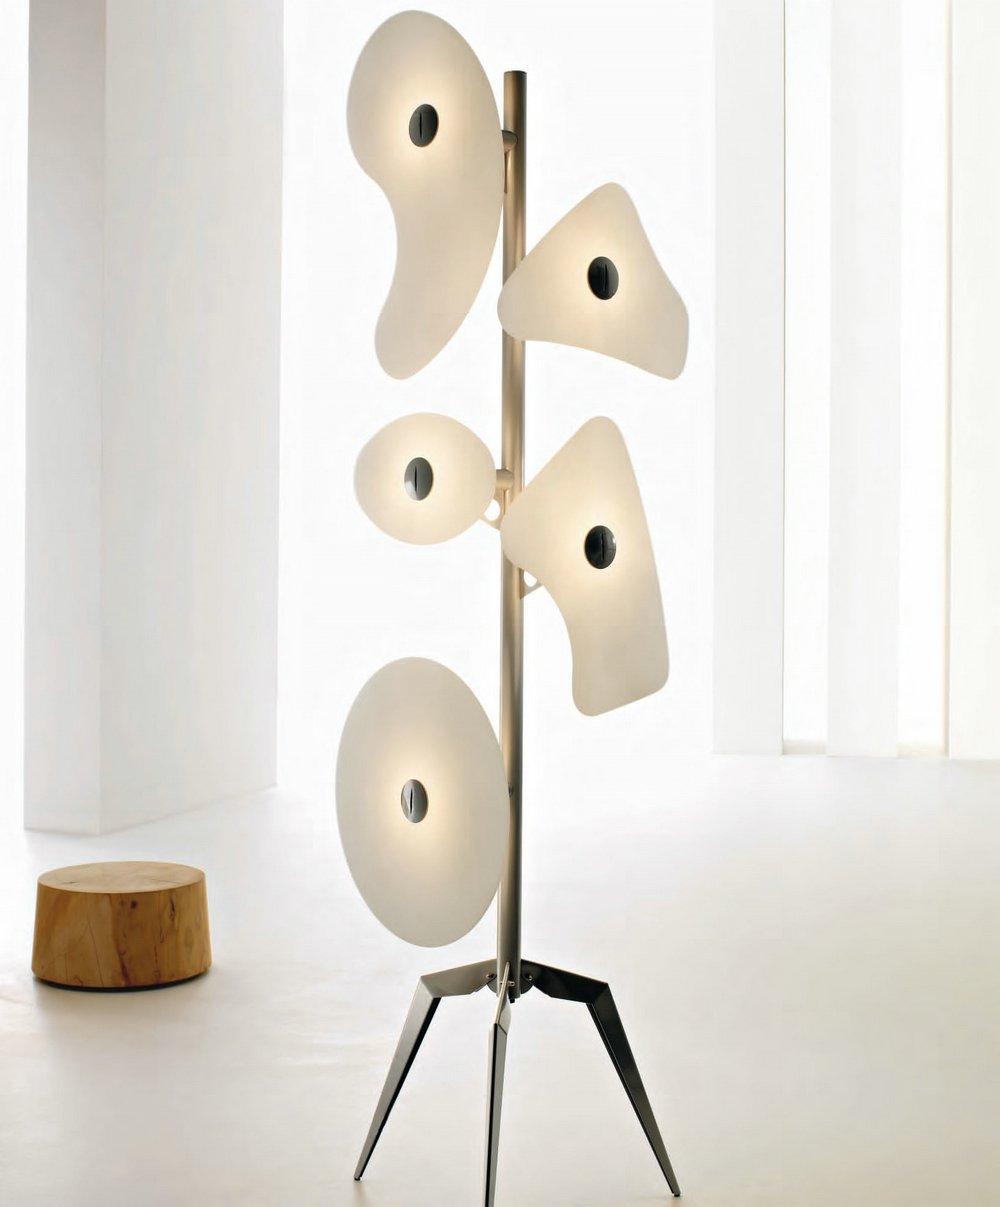 Orbital lámpara de Pie vidrios blancos